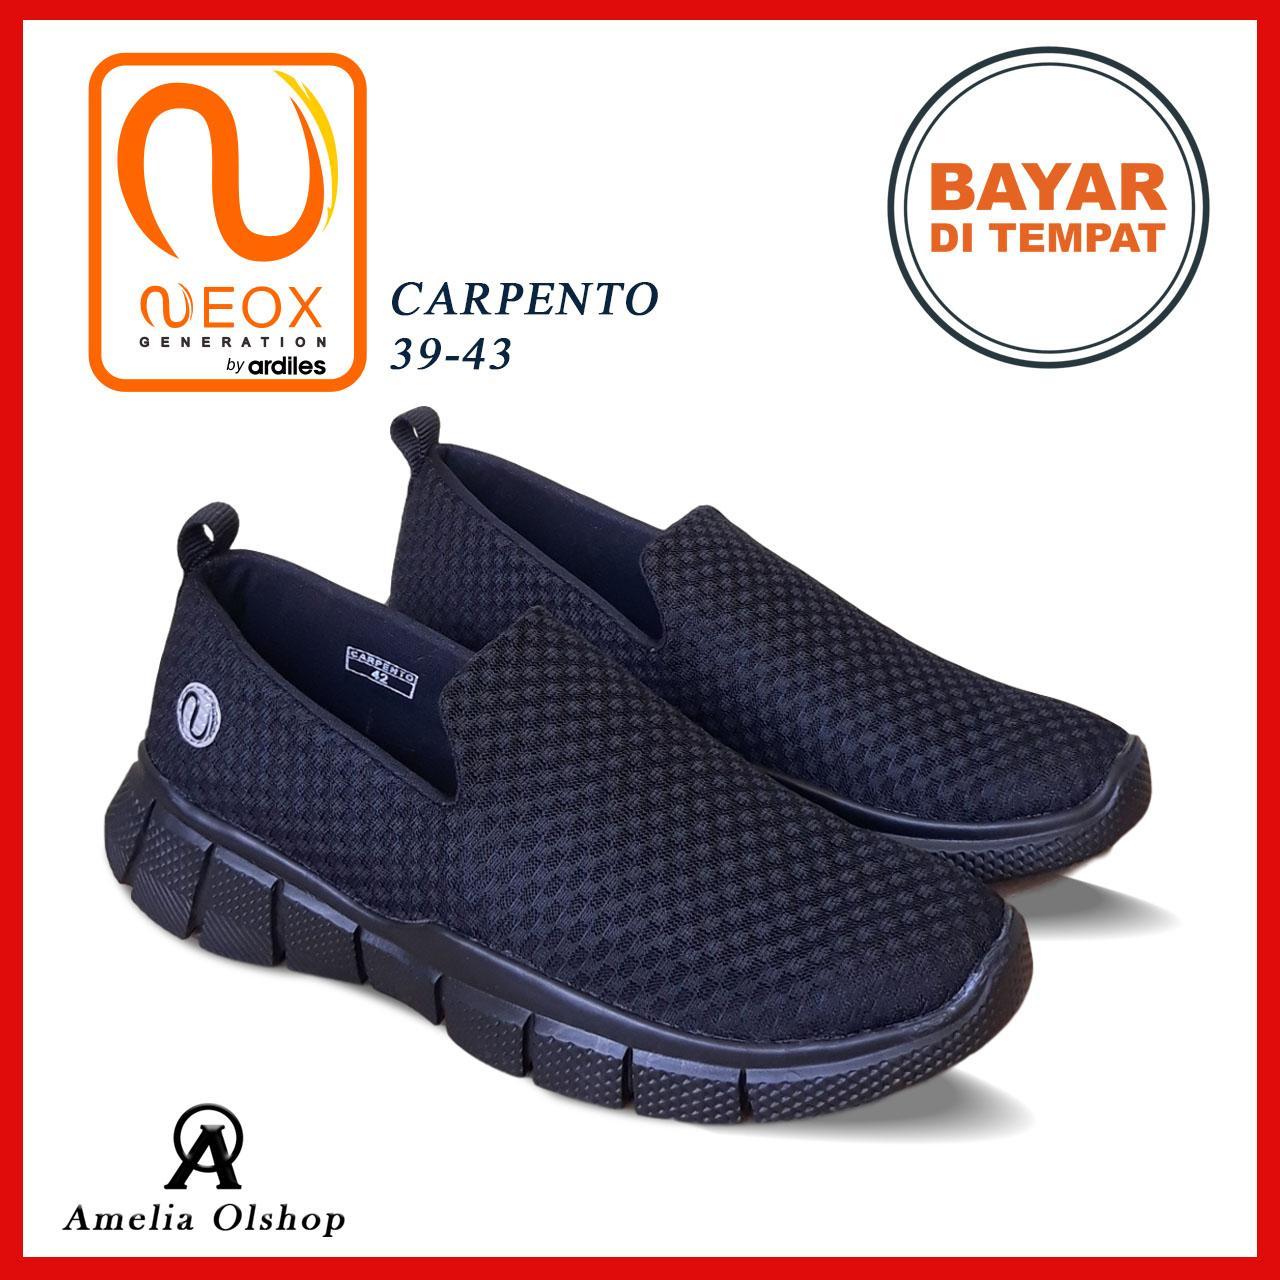 Features Amelia Olshop Sepatu Neox Carpento 39 43 Sepatu Pria Sepatu 87d8655b3d